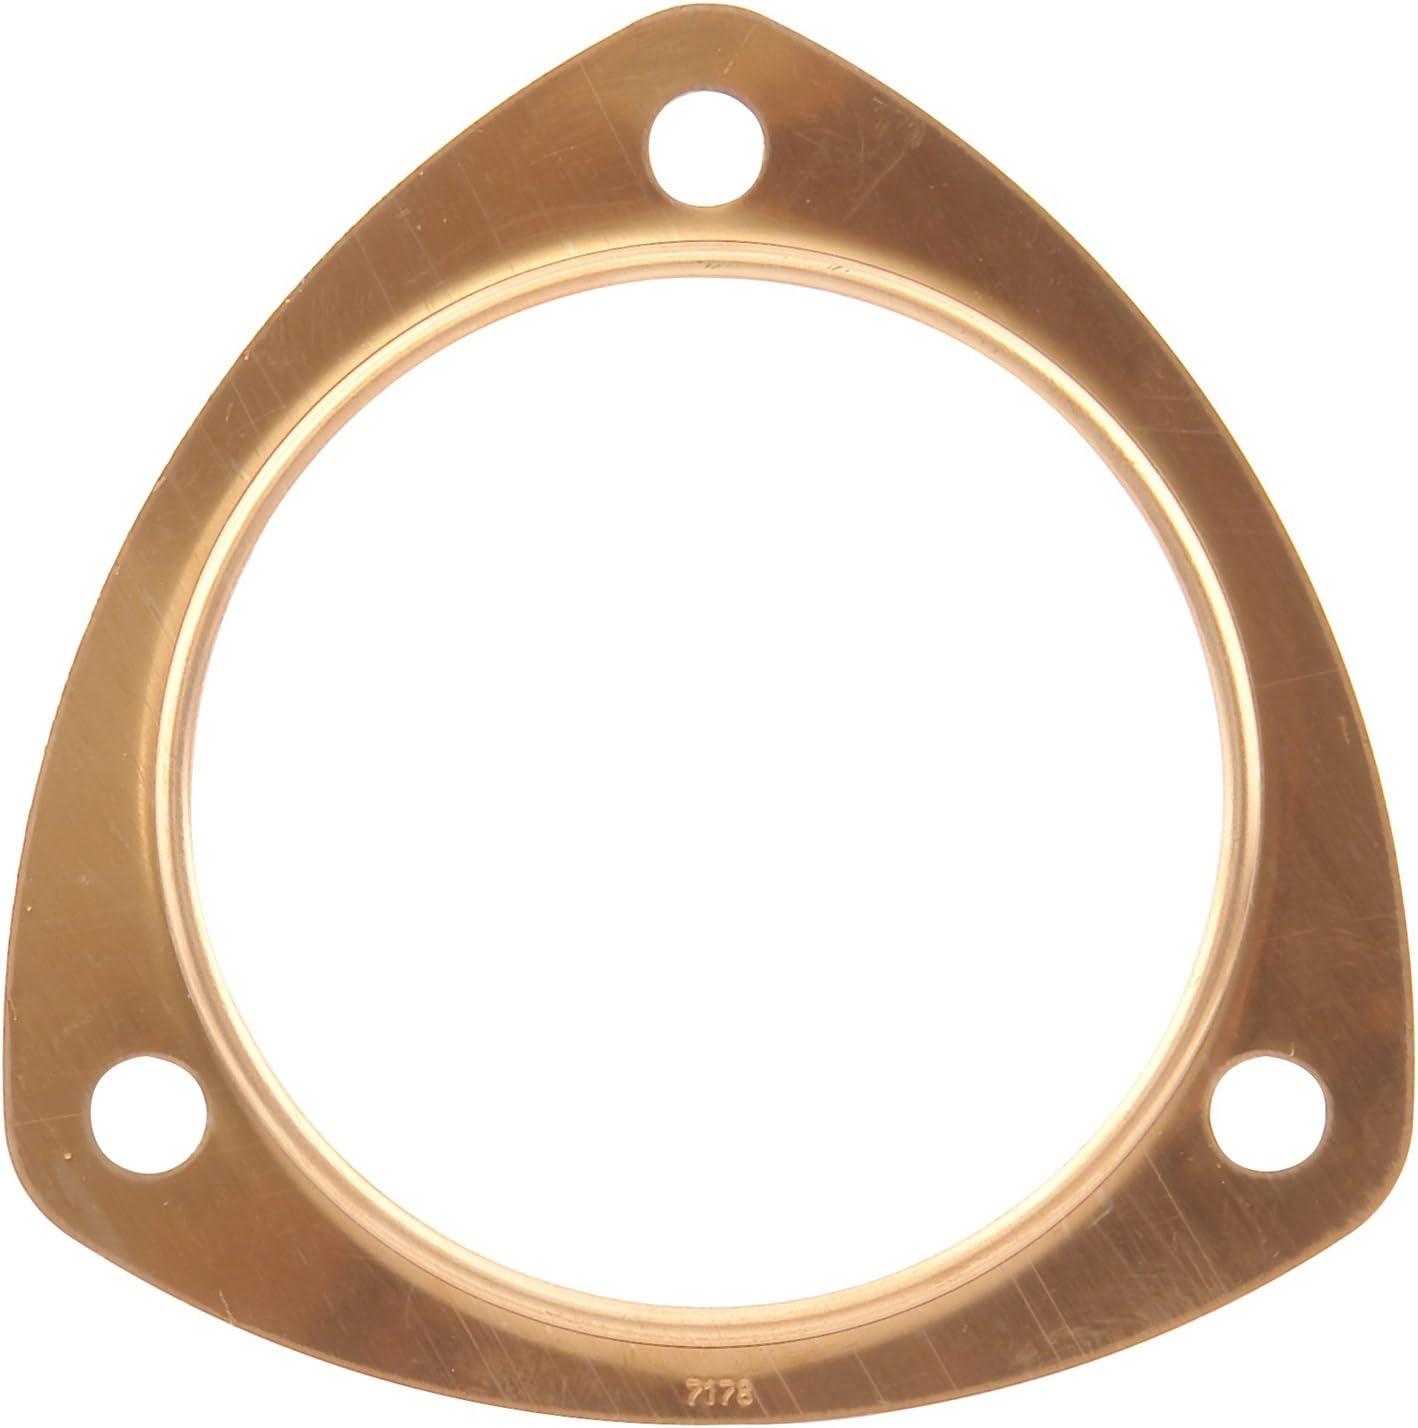 Mr Gasket 7167MRG Copper Exhaust Gasket